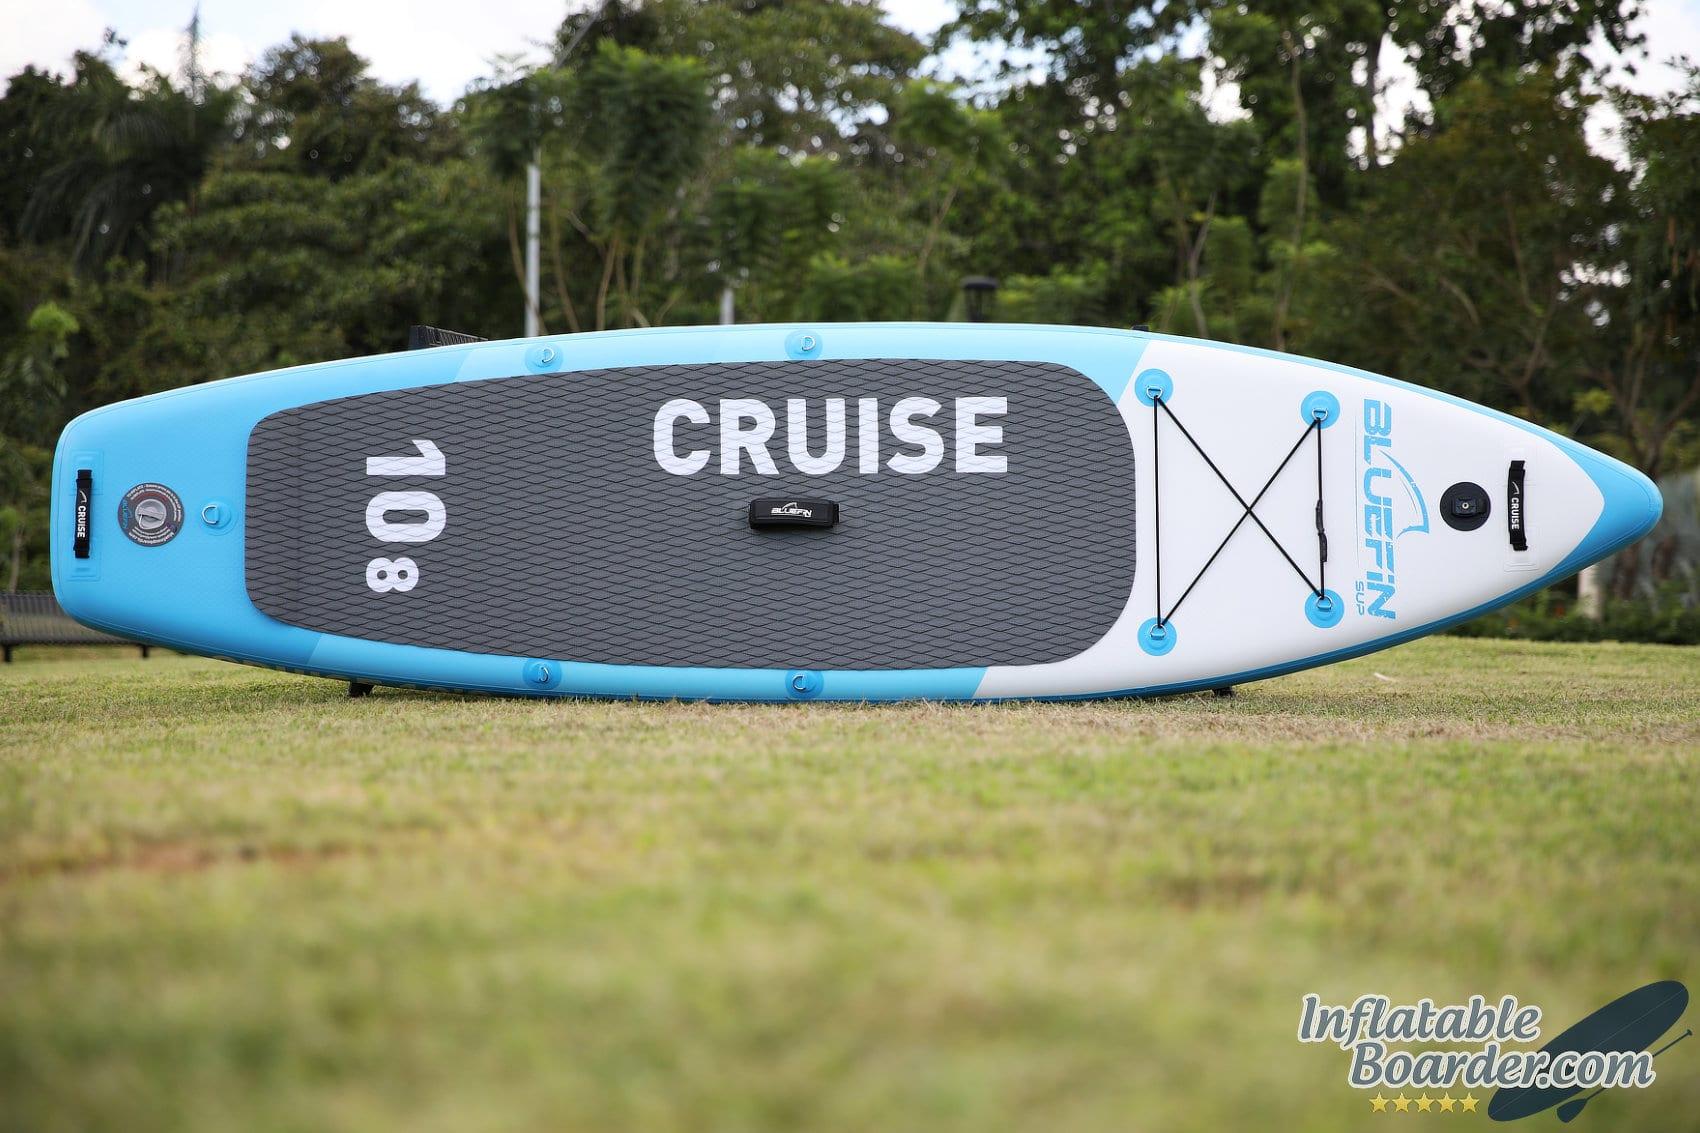 "Bluefin SUP Cruise 10'8"" Top Deck"